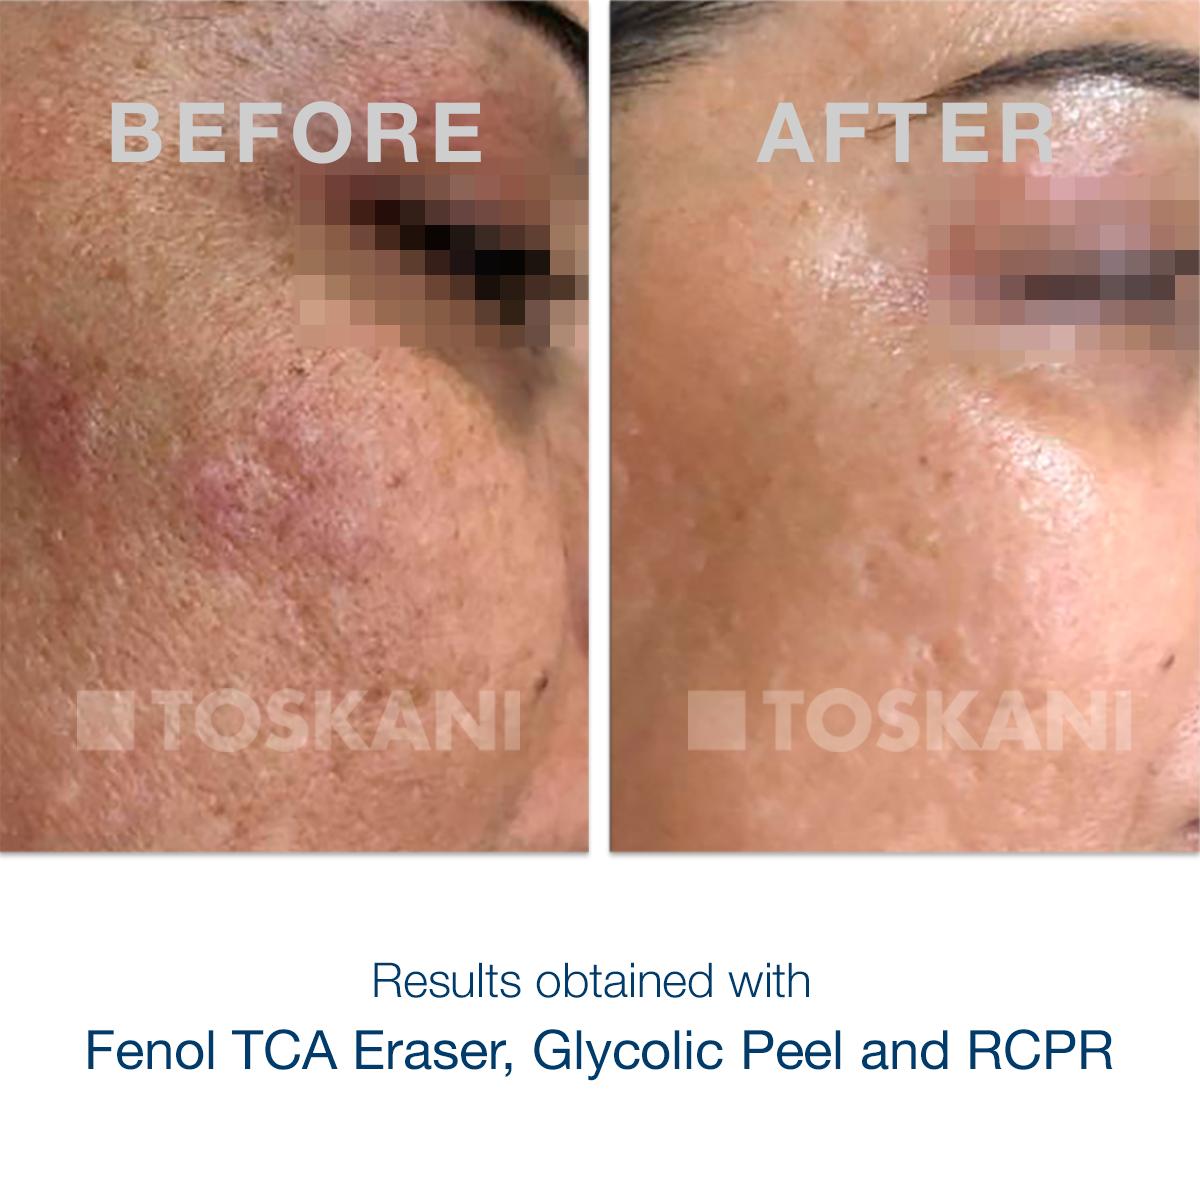 Fenol TCA Eraser-Results